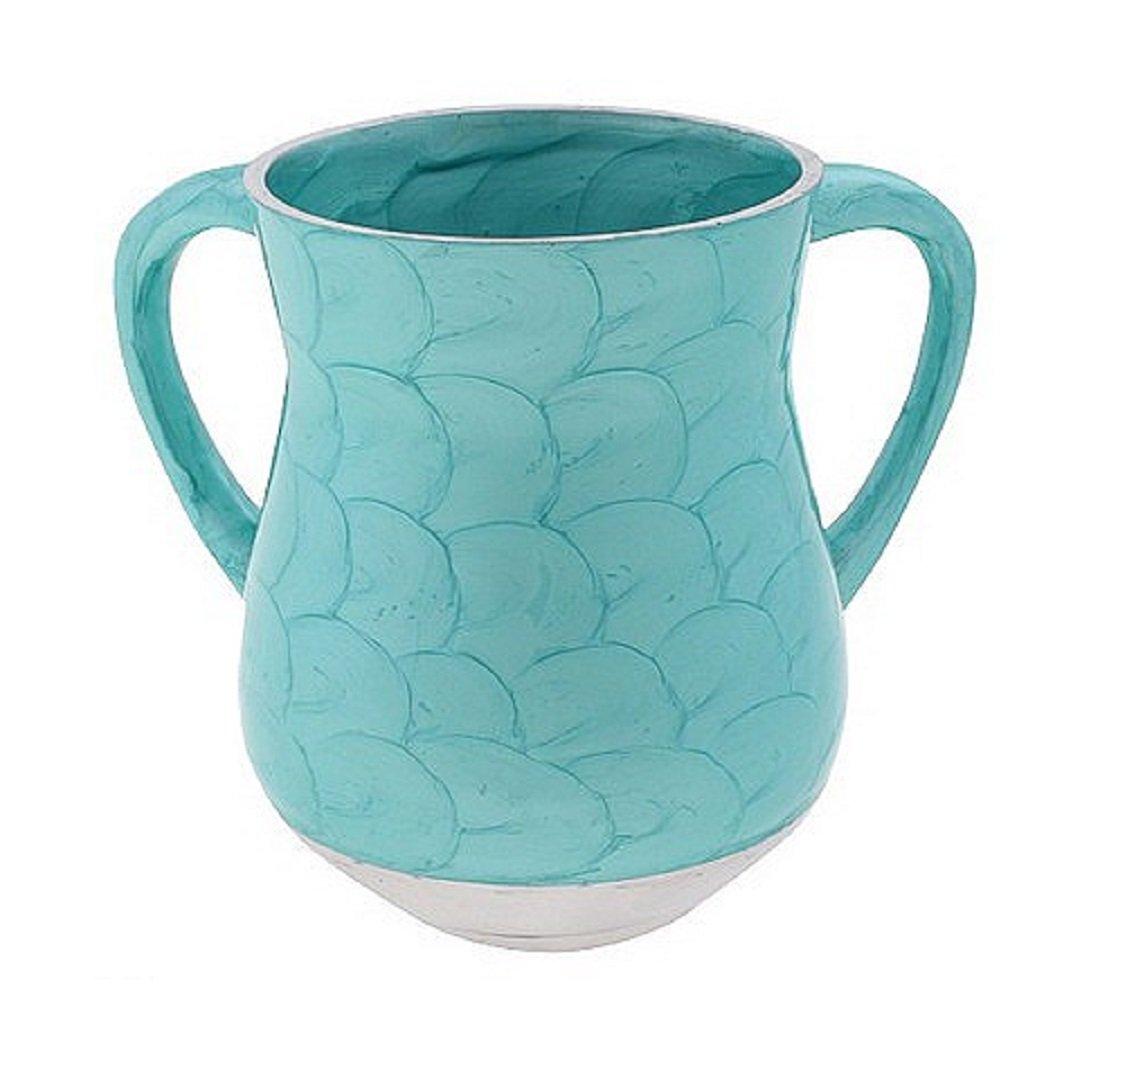 Art Judaica Wash Cup Polyresin Turquoise Waves - Jewish Hand Washing - Netilat Yadayim